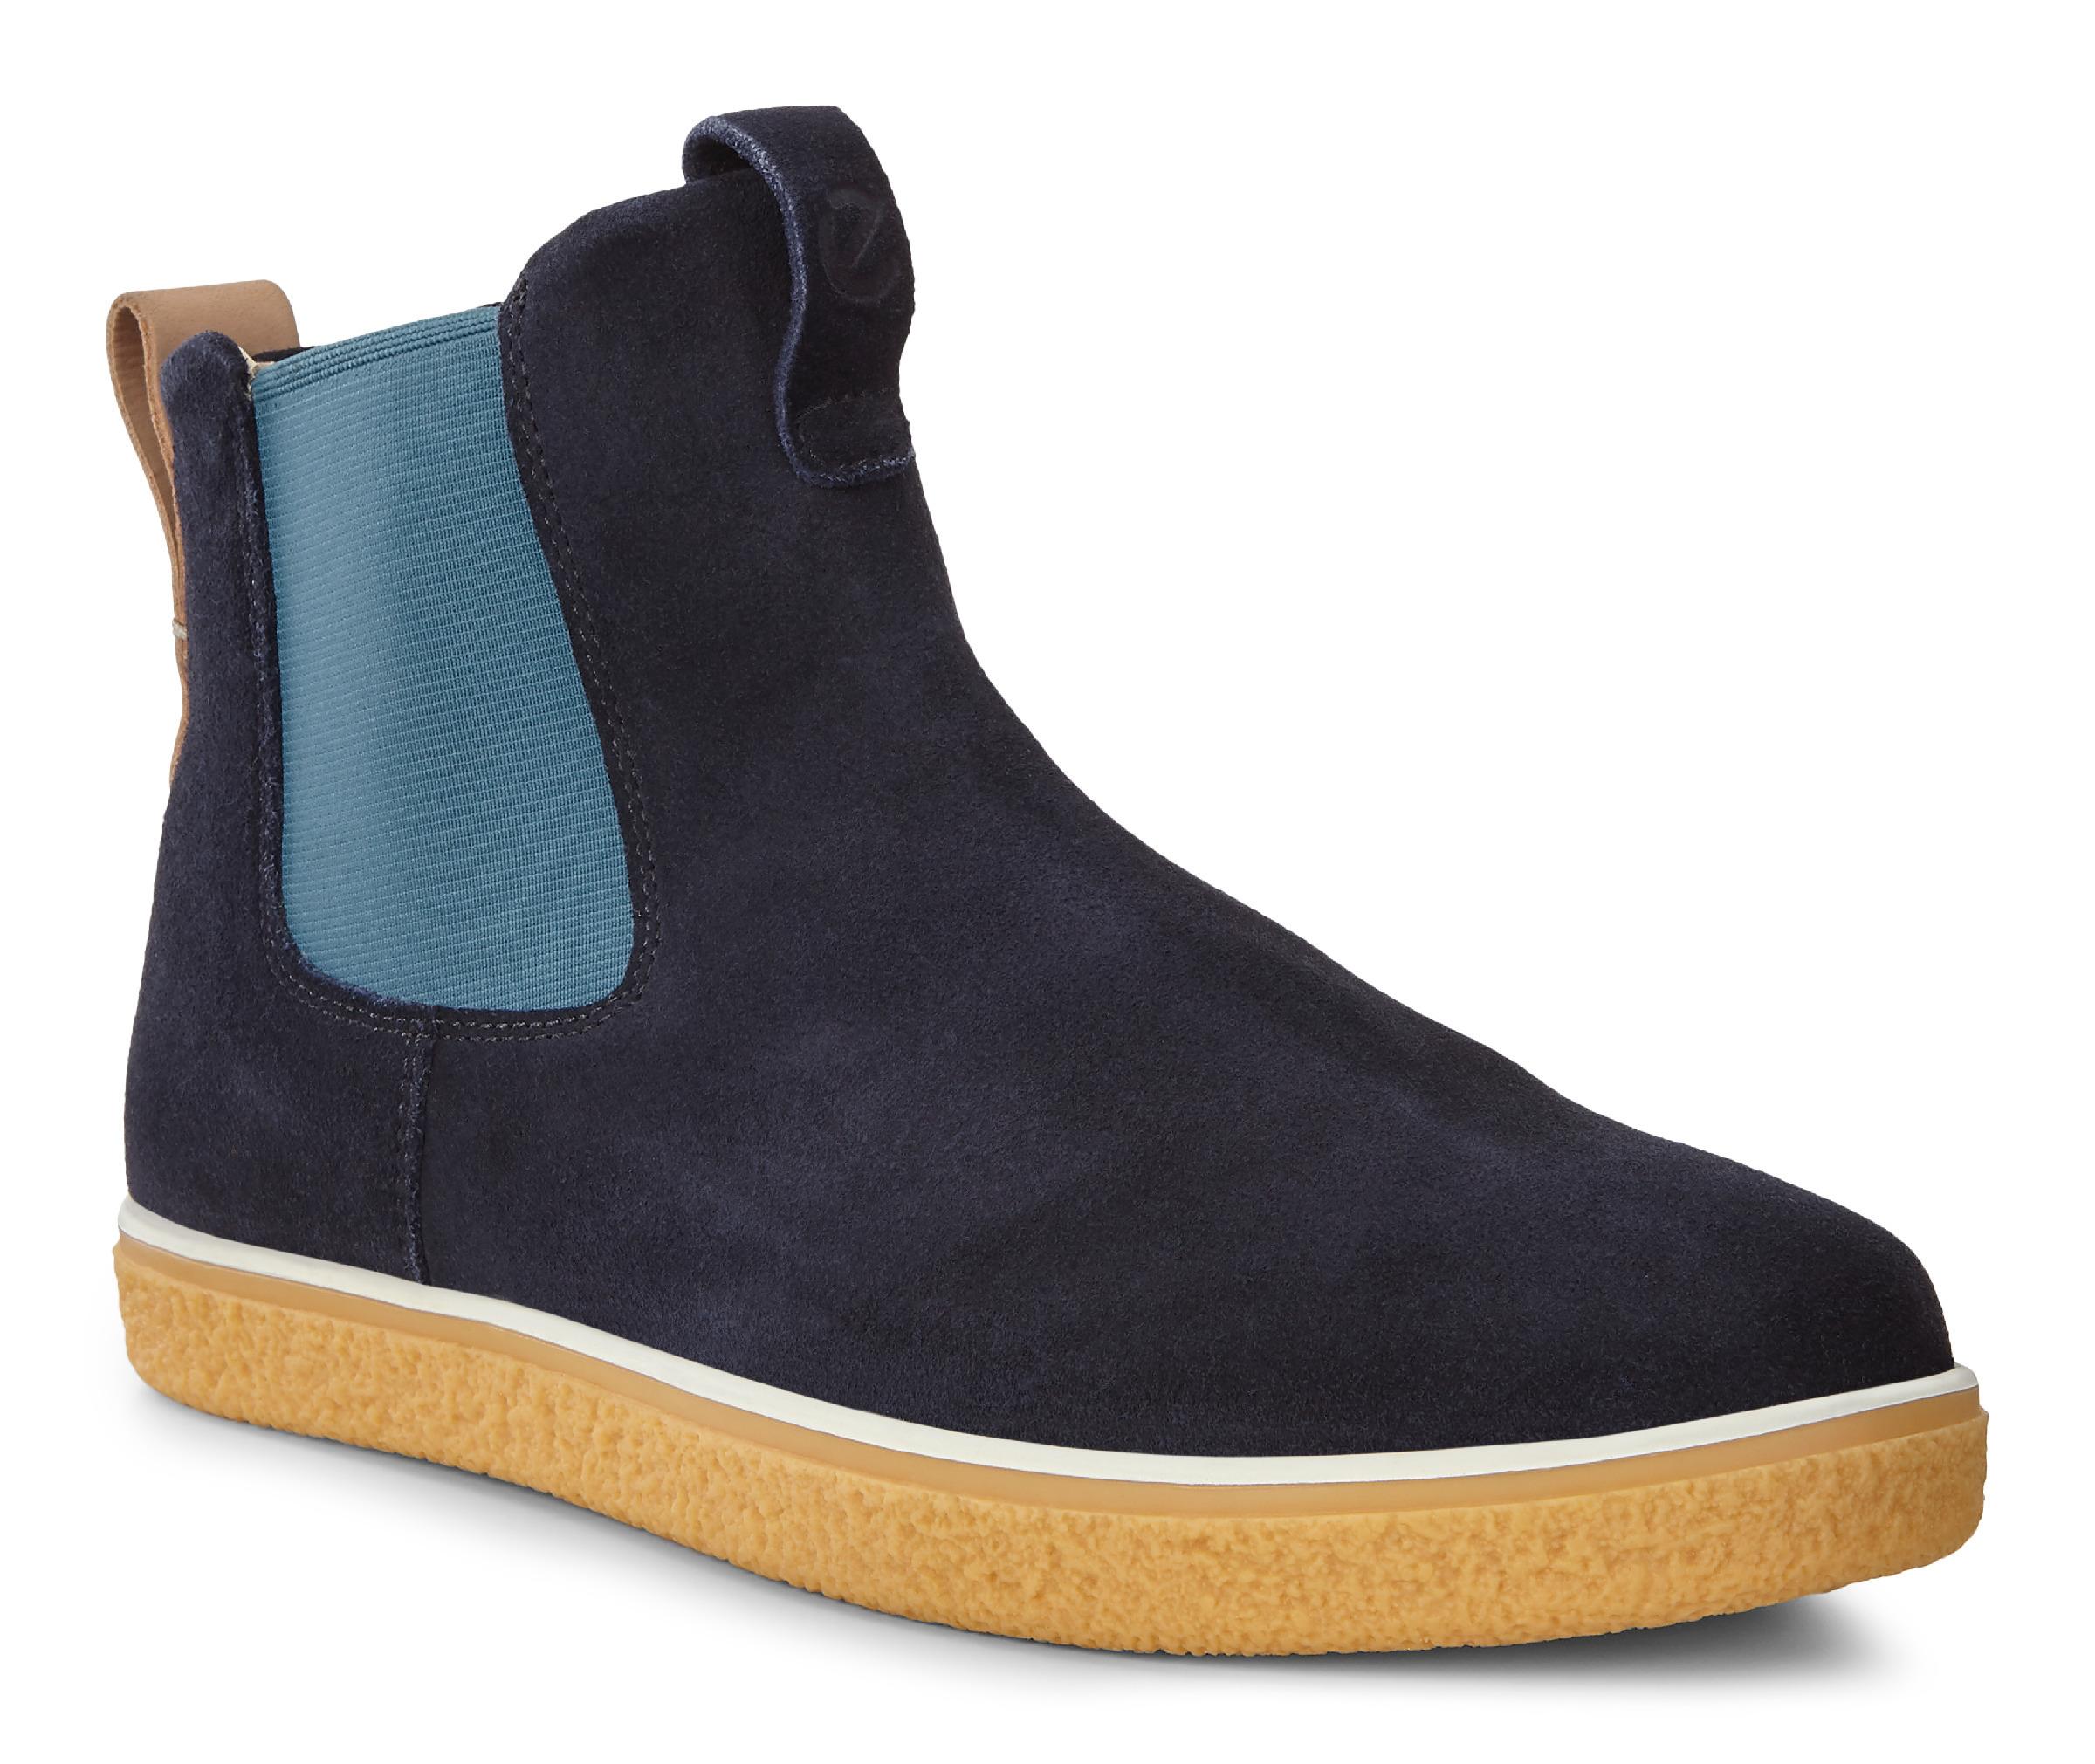 Kinder Schuhe | Im offiziellen ECCO® Shop